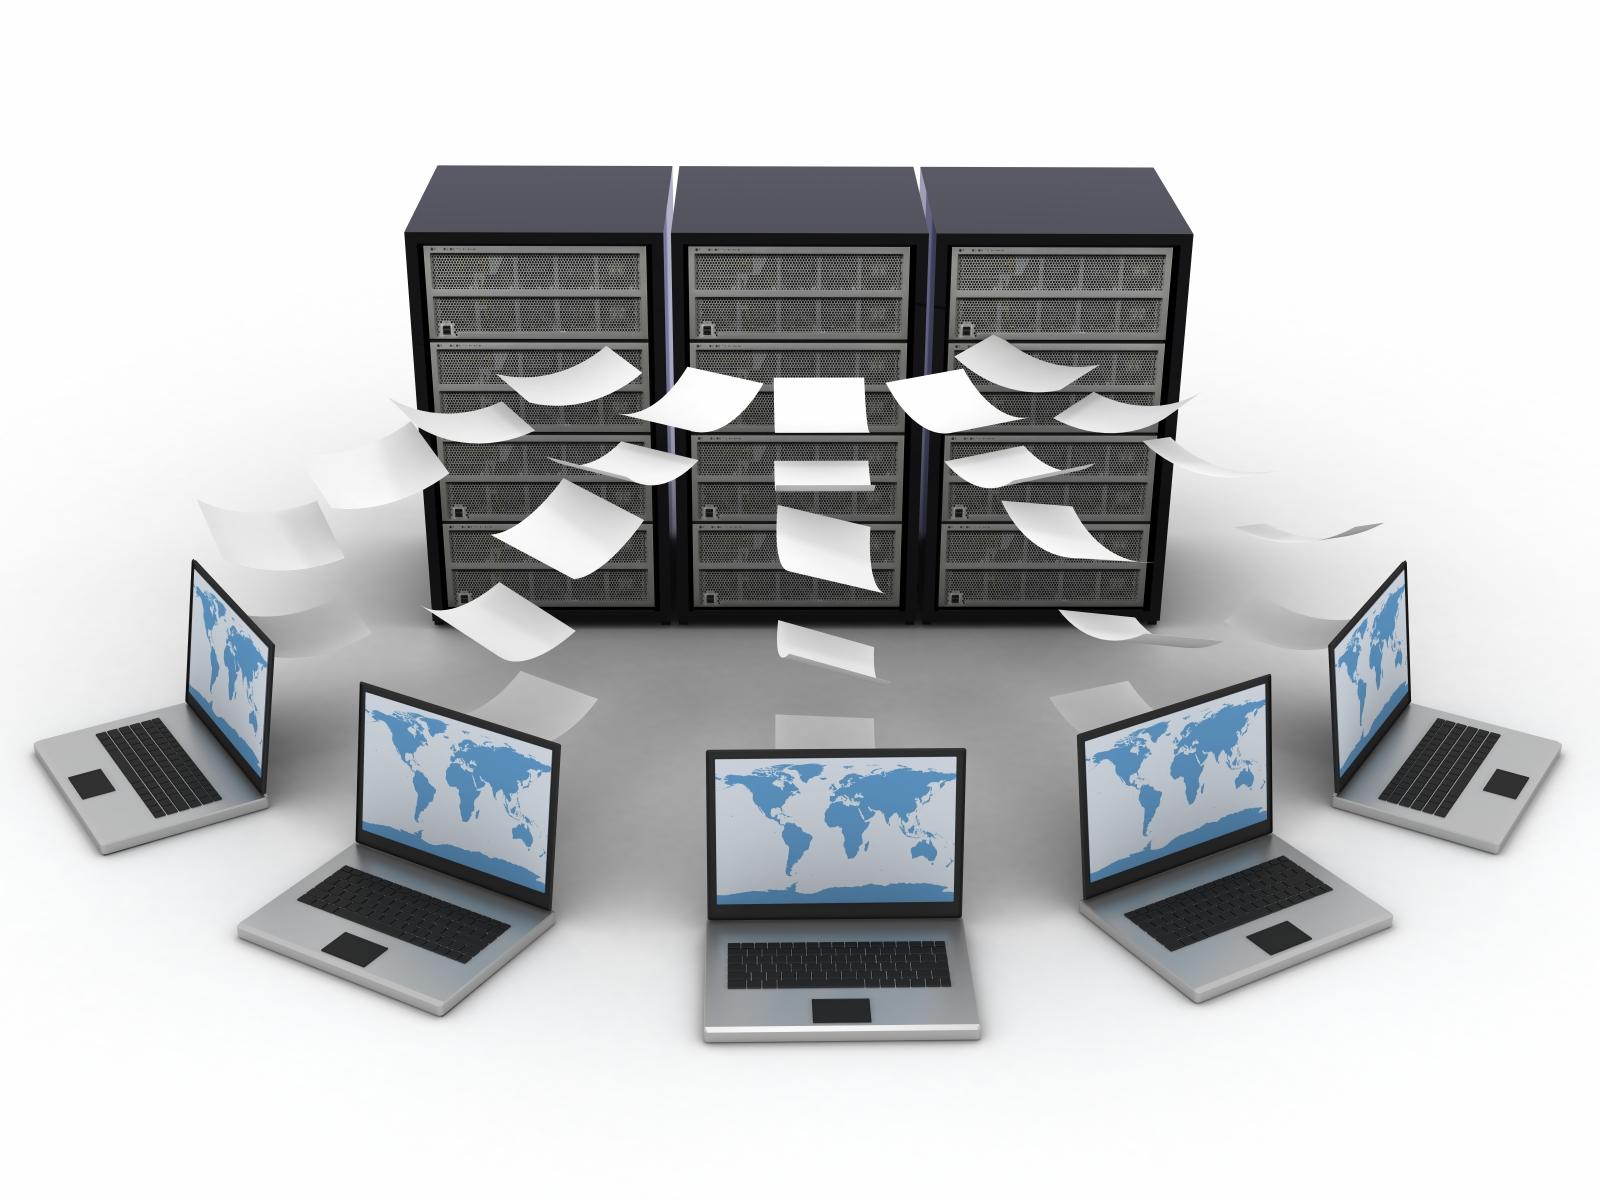 Should you use off-site data backups